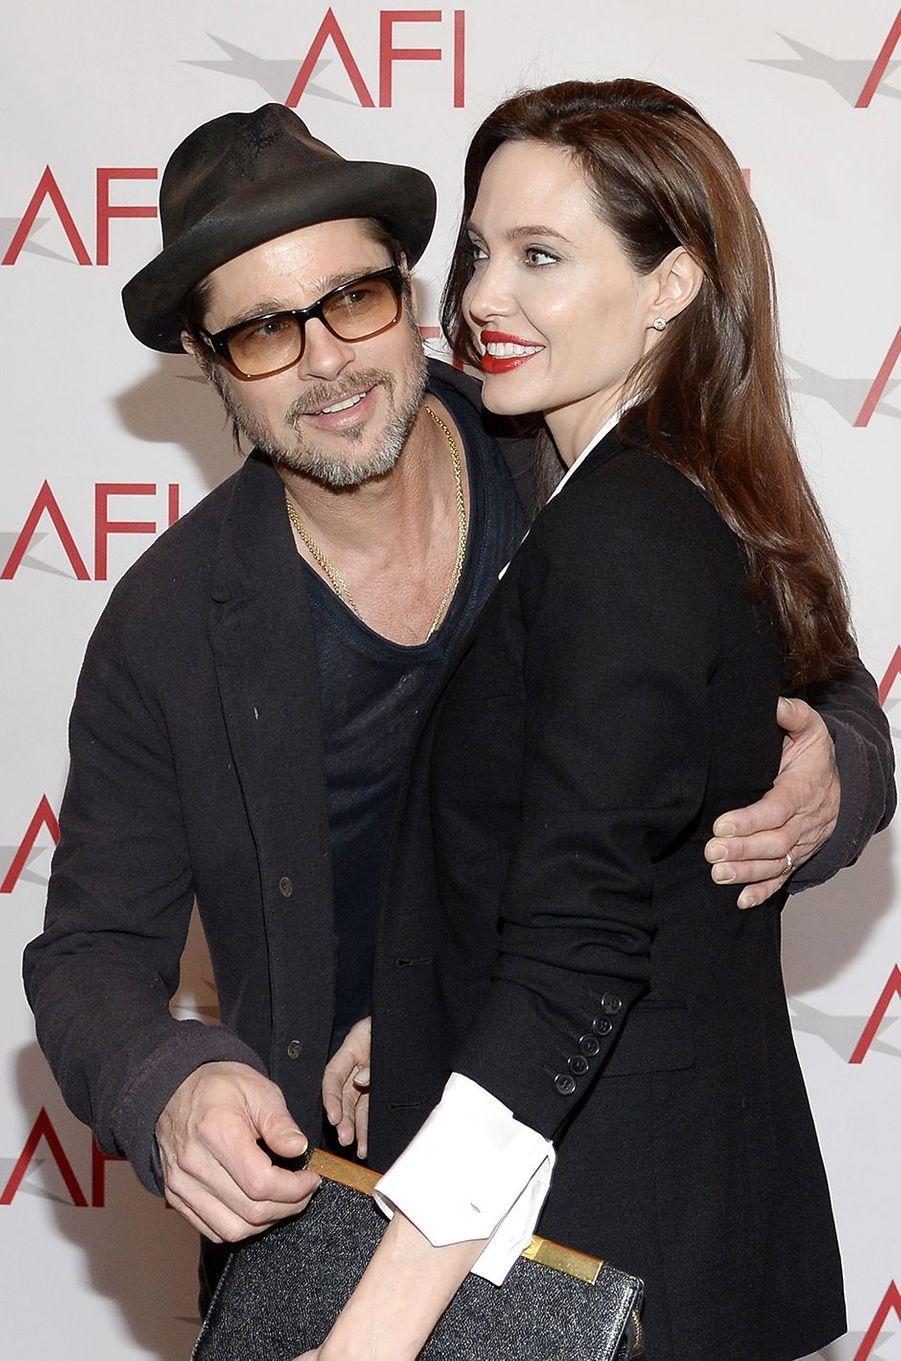 Angelina Jolie et Brad Pitt aux AFI Awards en janvier 2015.